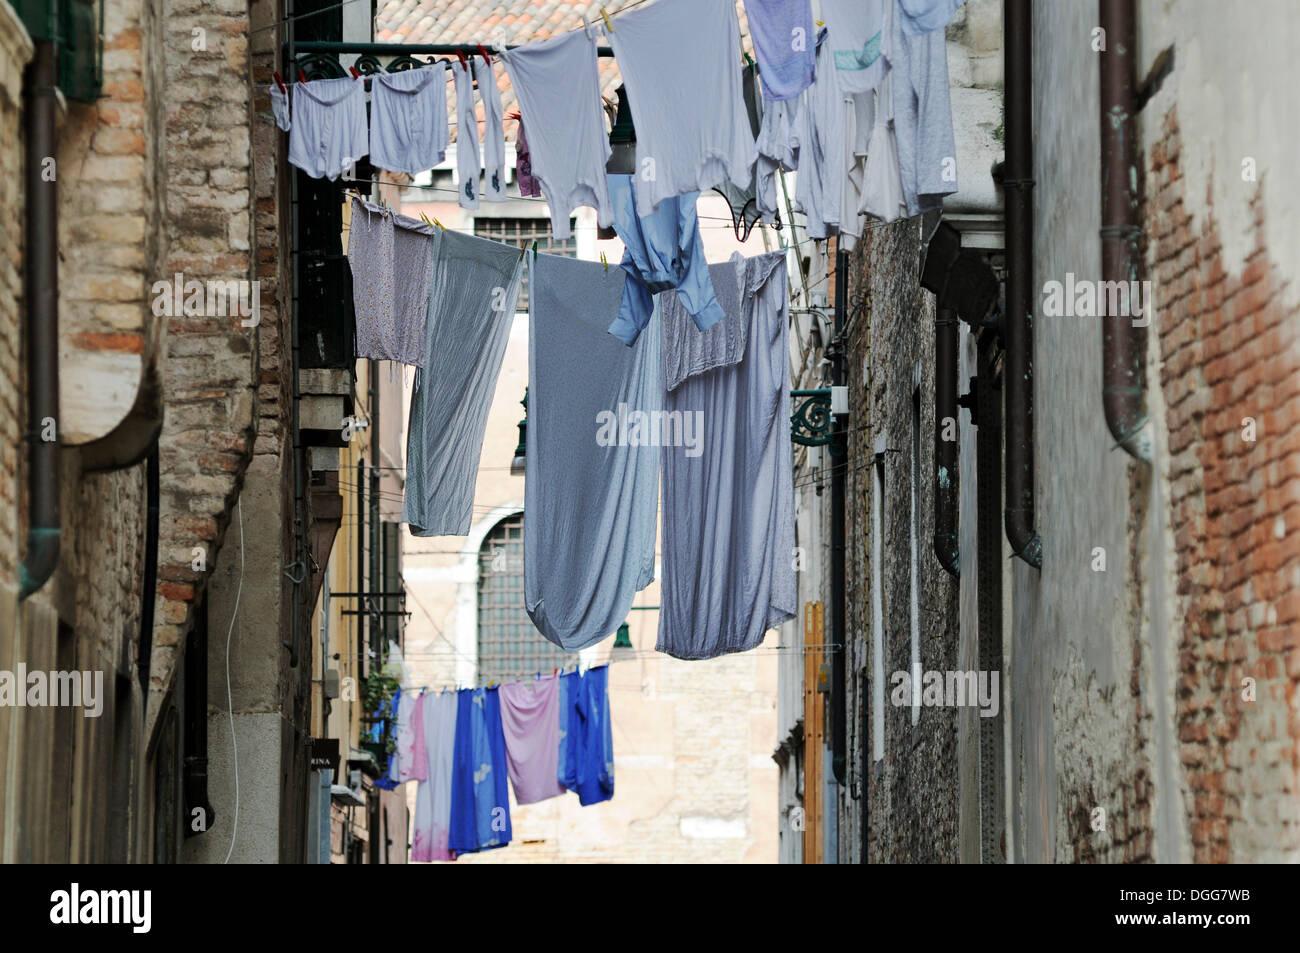 Closely built houses, washing hanging on washing lines stretched over a lane, Castello, Venice, Venezia, Veneto, Italy, Europe - Stock Image